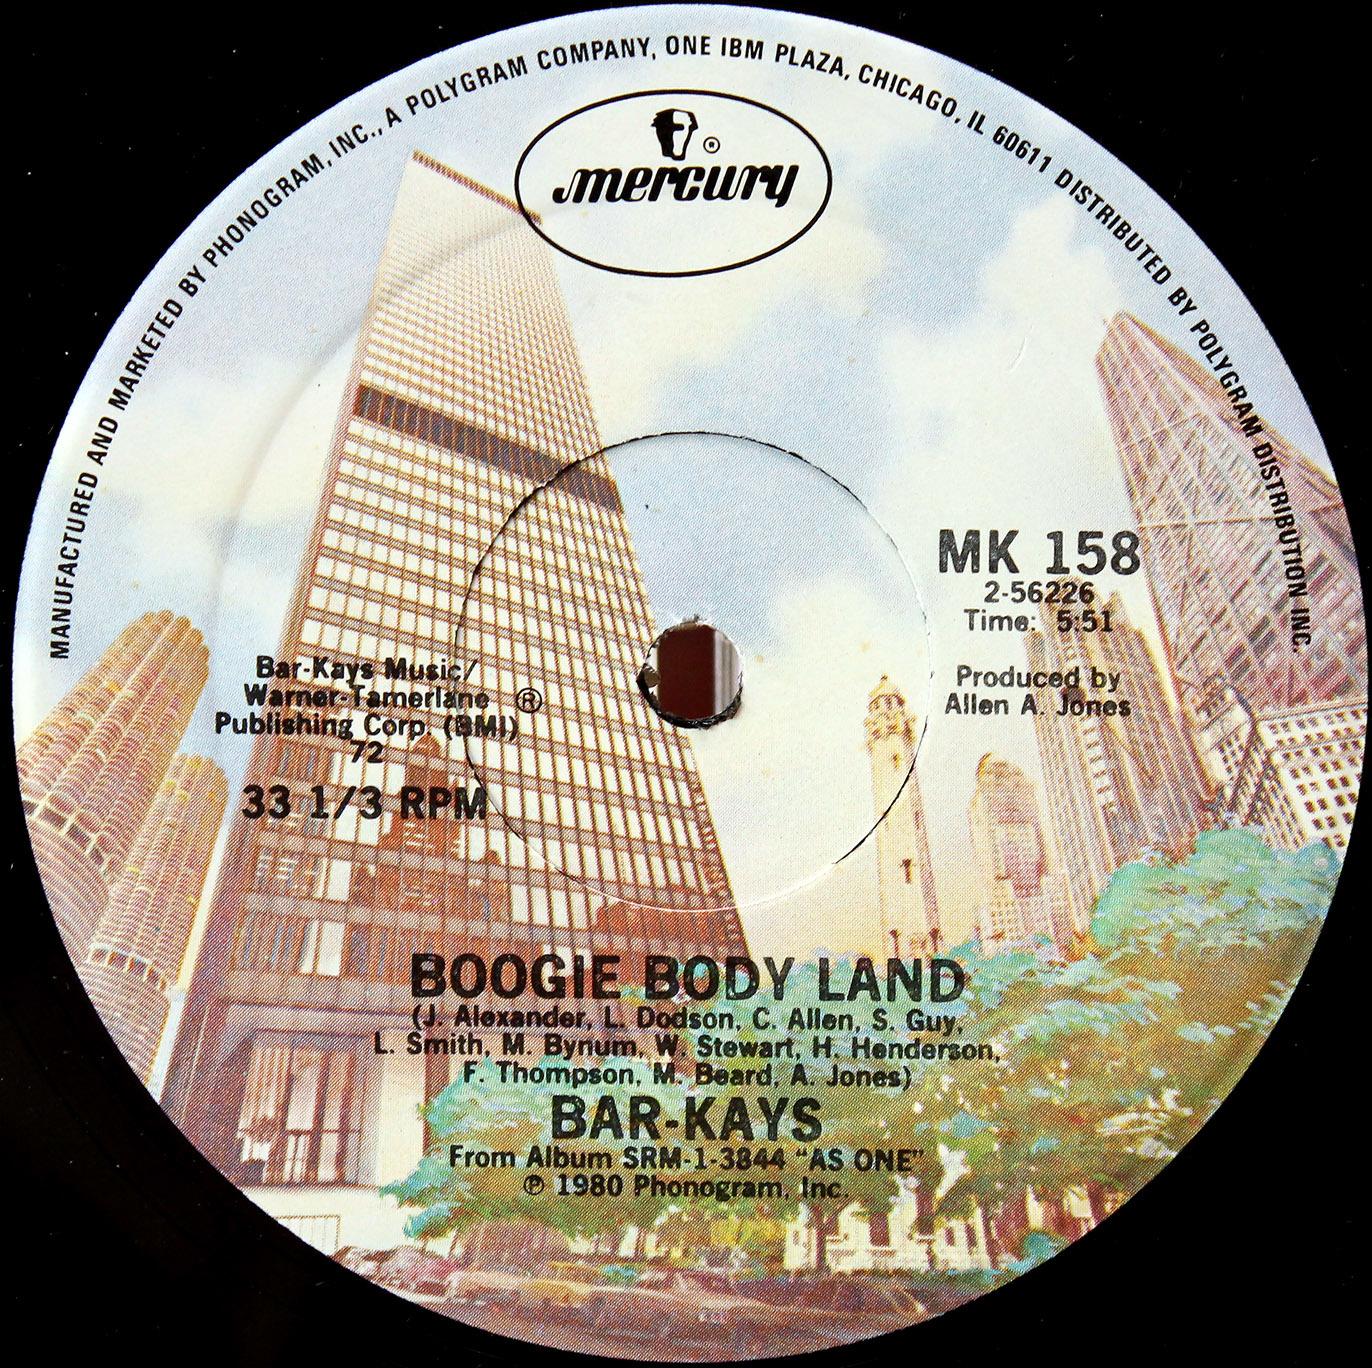 Bar-Kays – Boogie Body Land 02